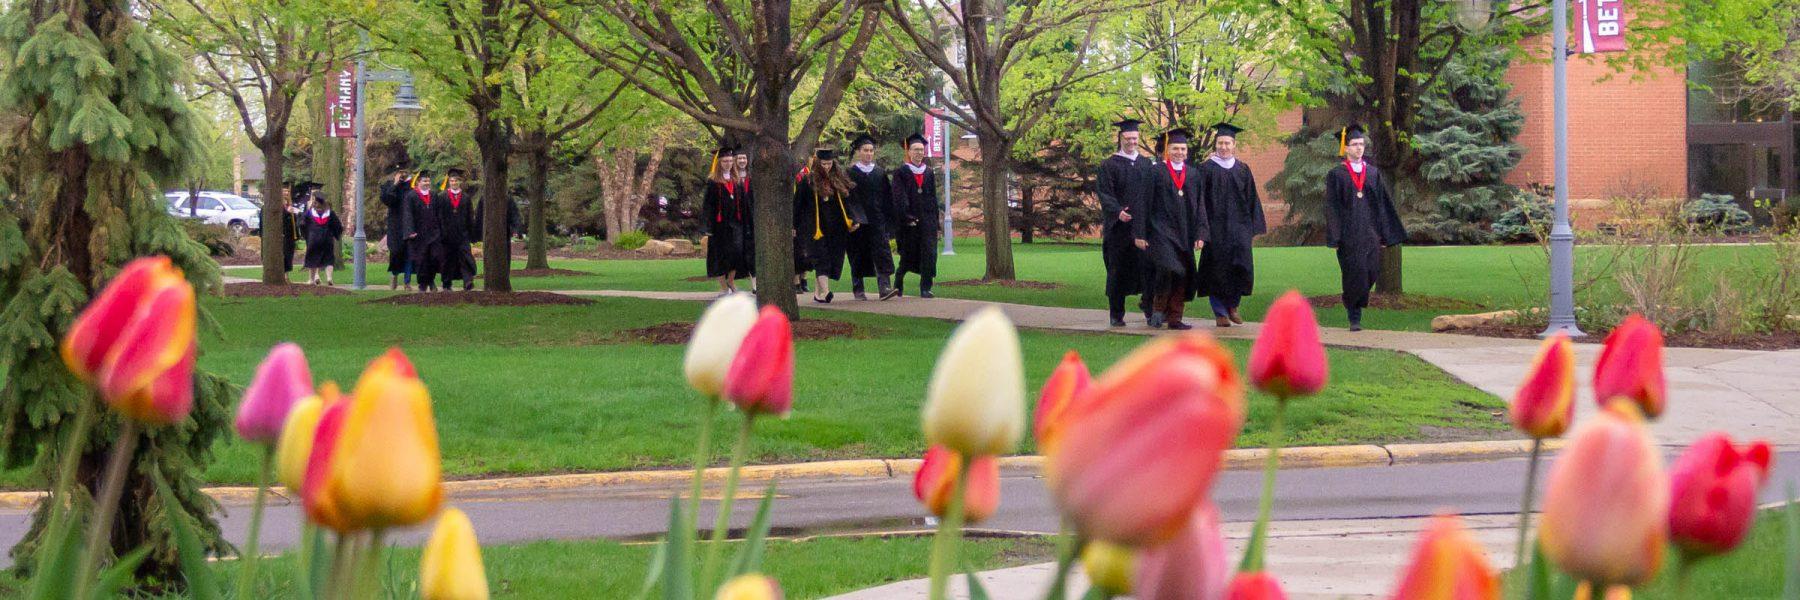 Graduates walking across campus before commencement